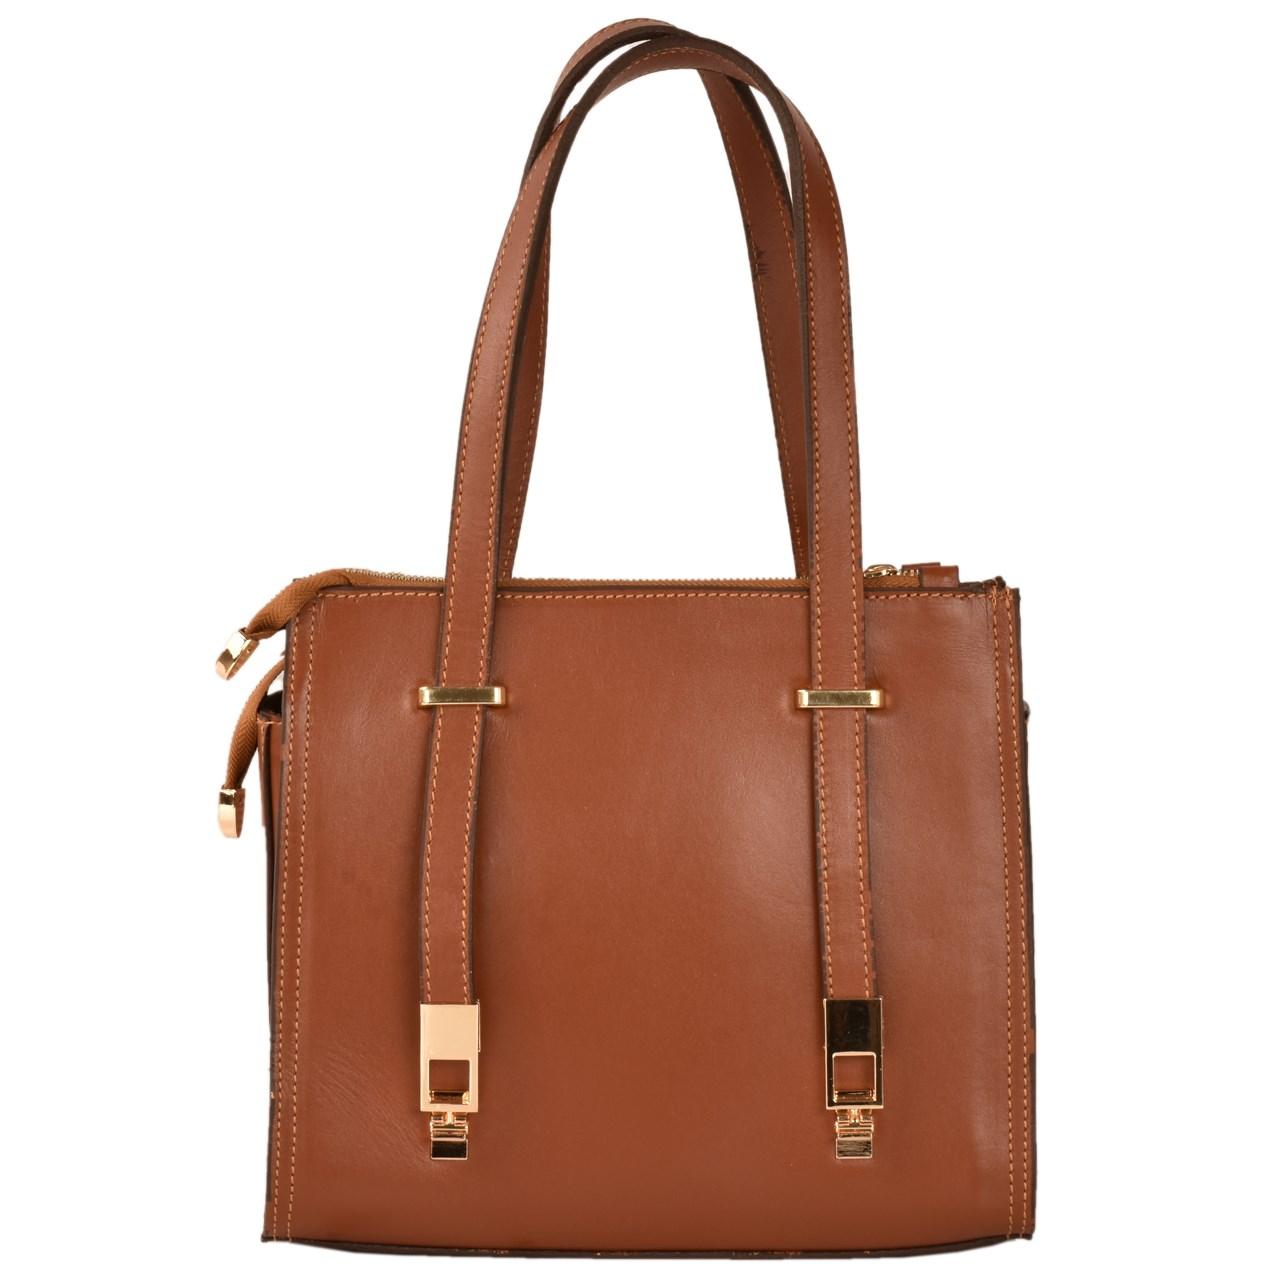 کیف دستی چرم طبیعی کهن چرم مدل V159-1